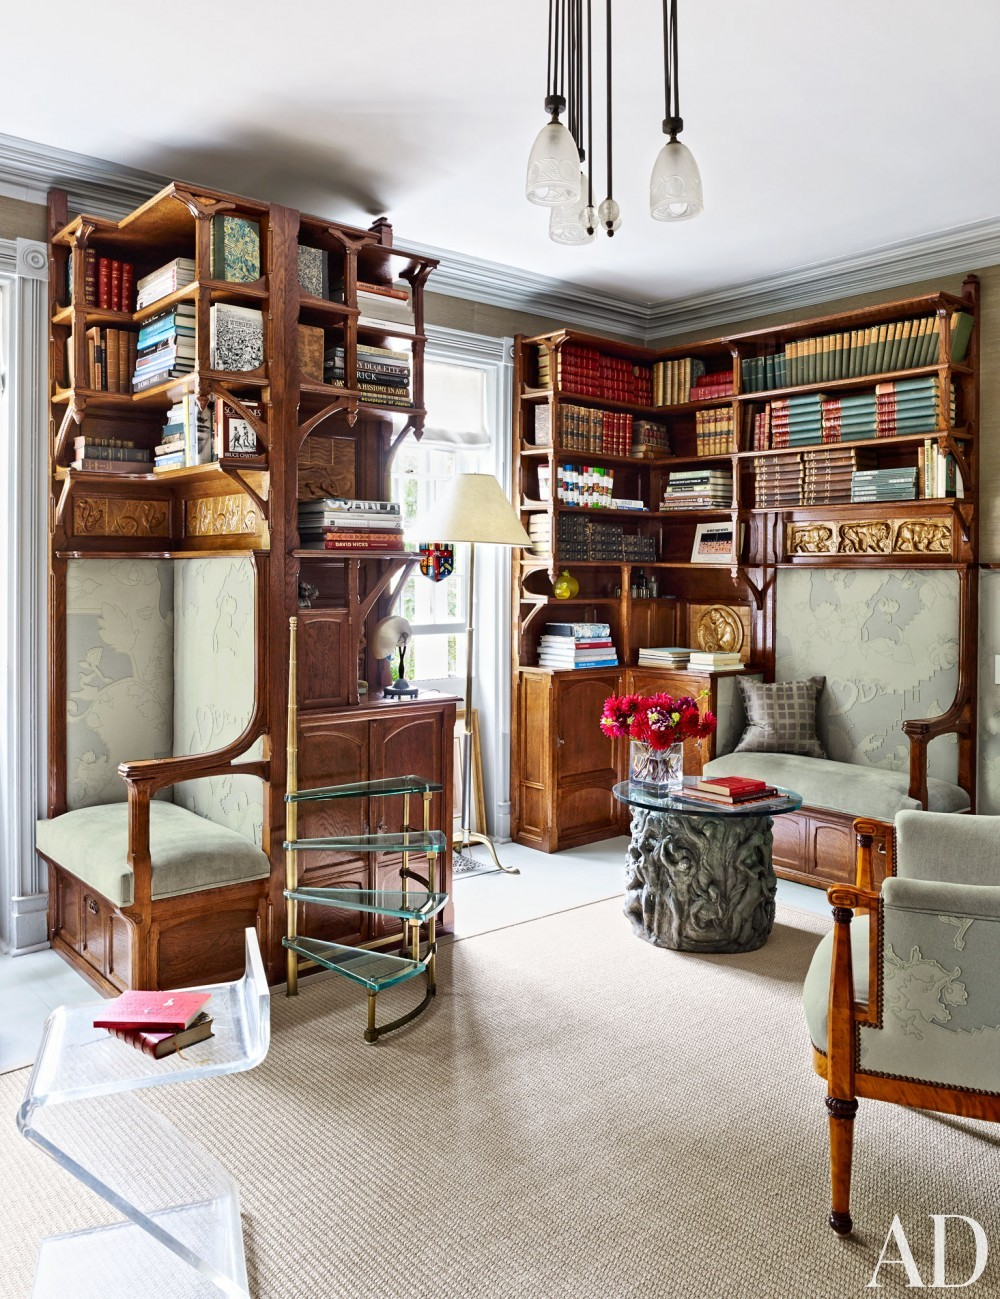 Traditional Office/Library by D\'Aquino Monaco and D\'Aquino Monaco in Hudson River Valley, NY